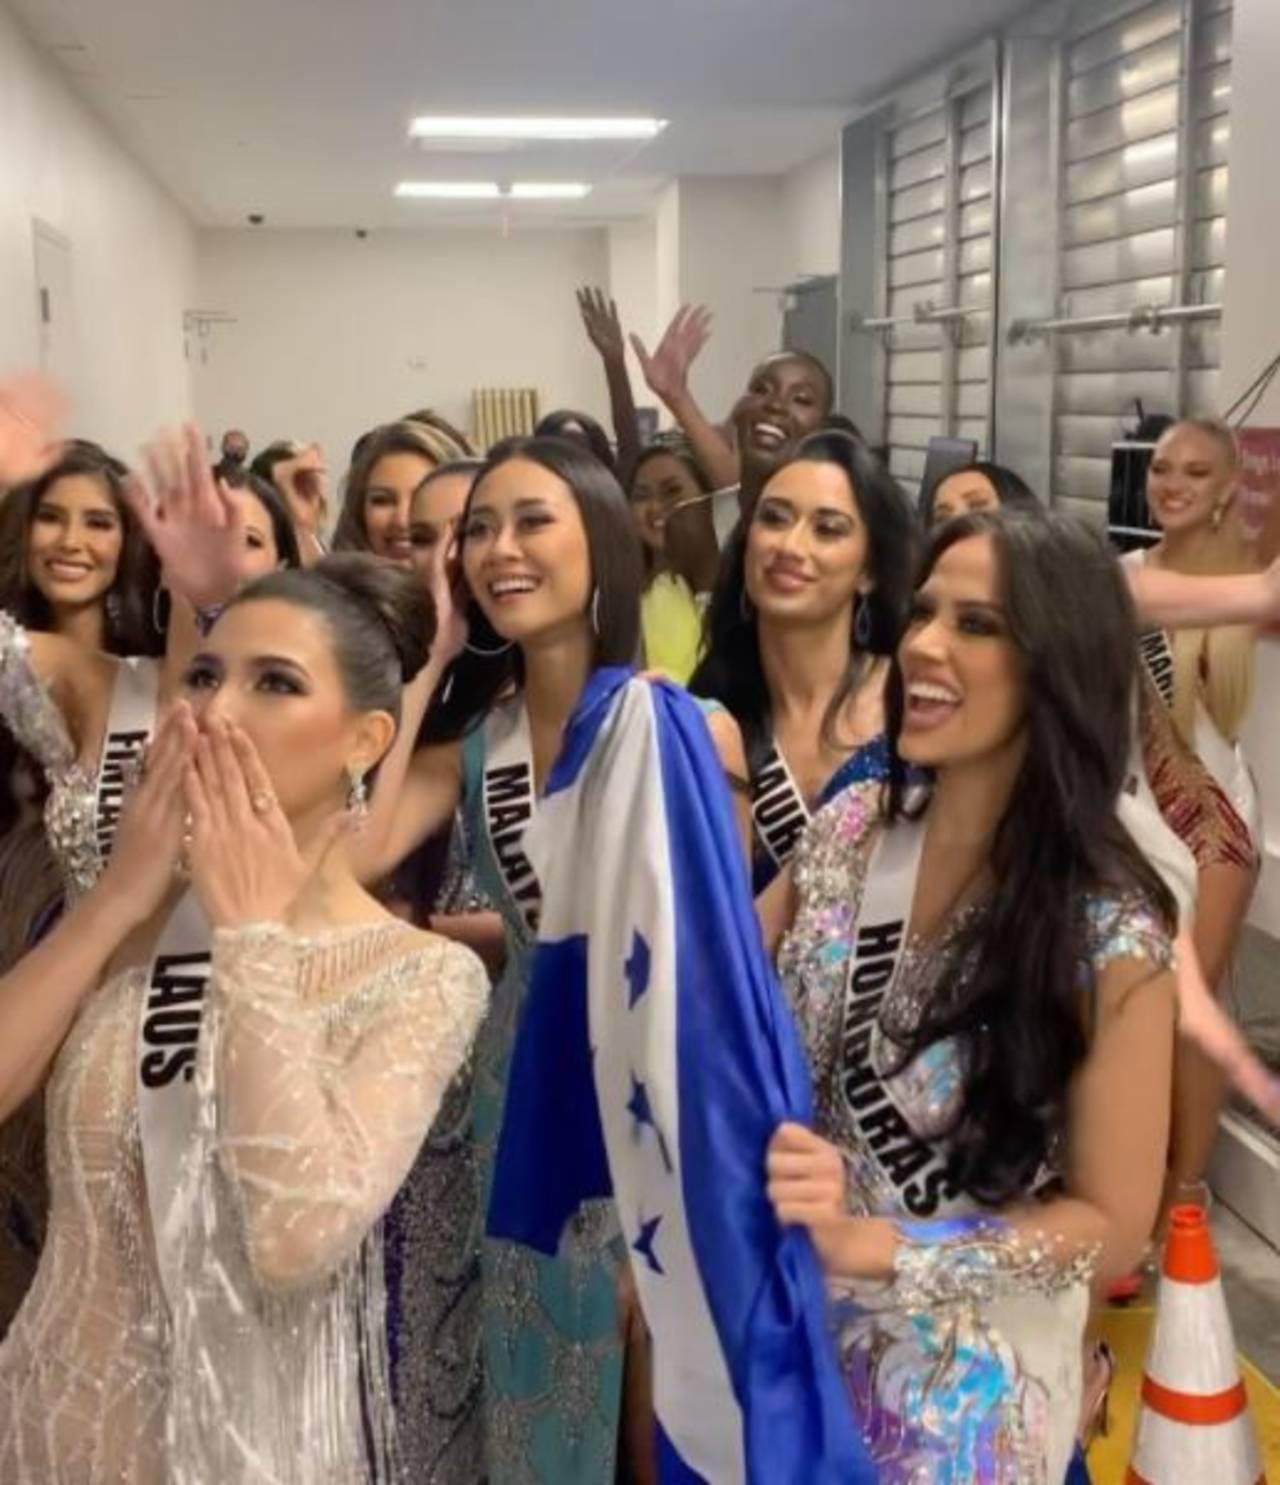 Oaxaca señala como violencia simbólica a los concursos de belleza